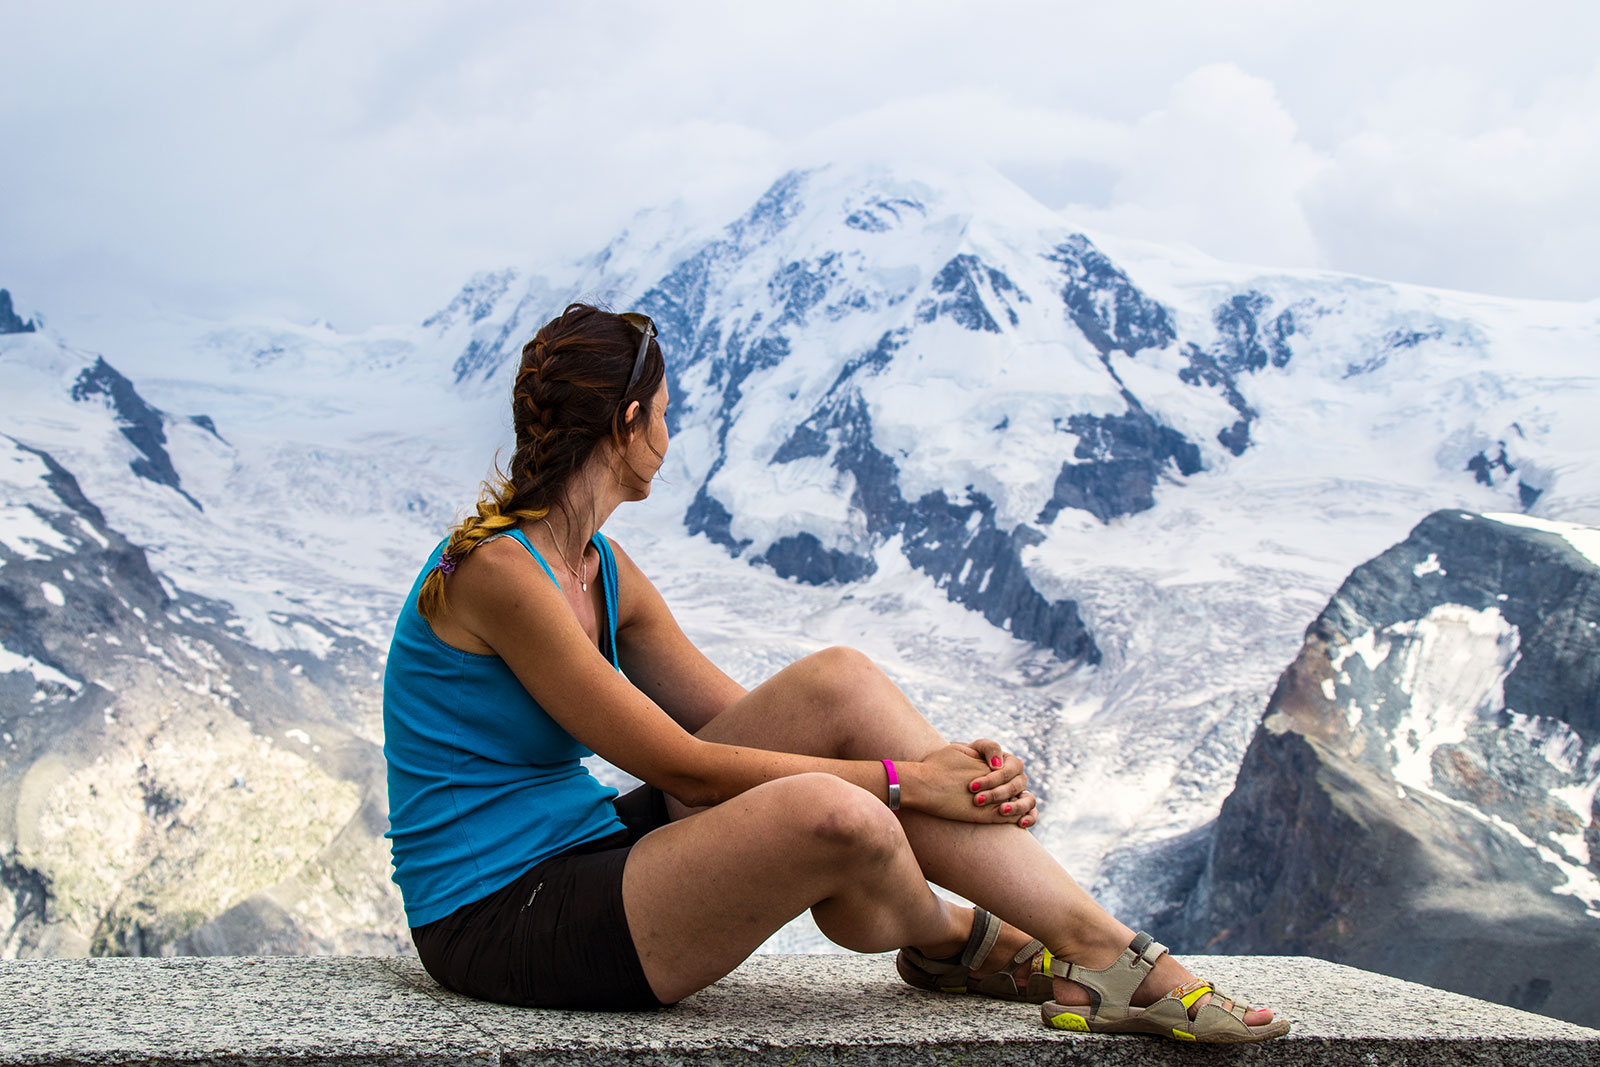 Nerea en el mirador Gornergratt – Zermatt en dos días